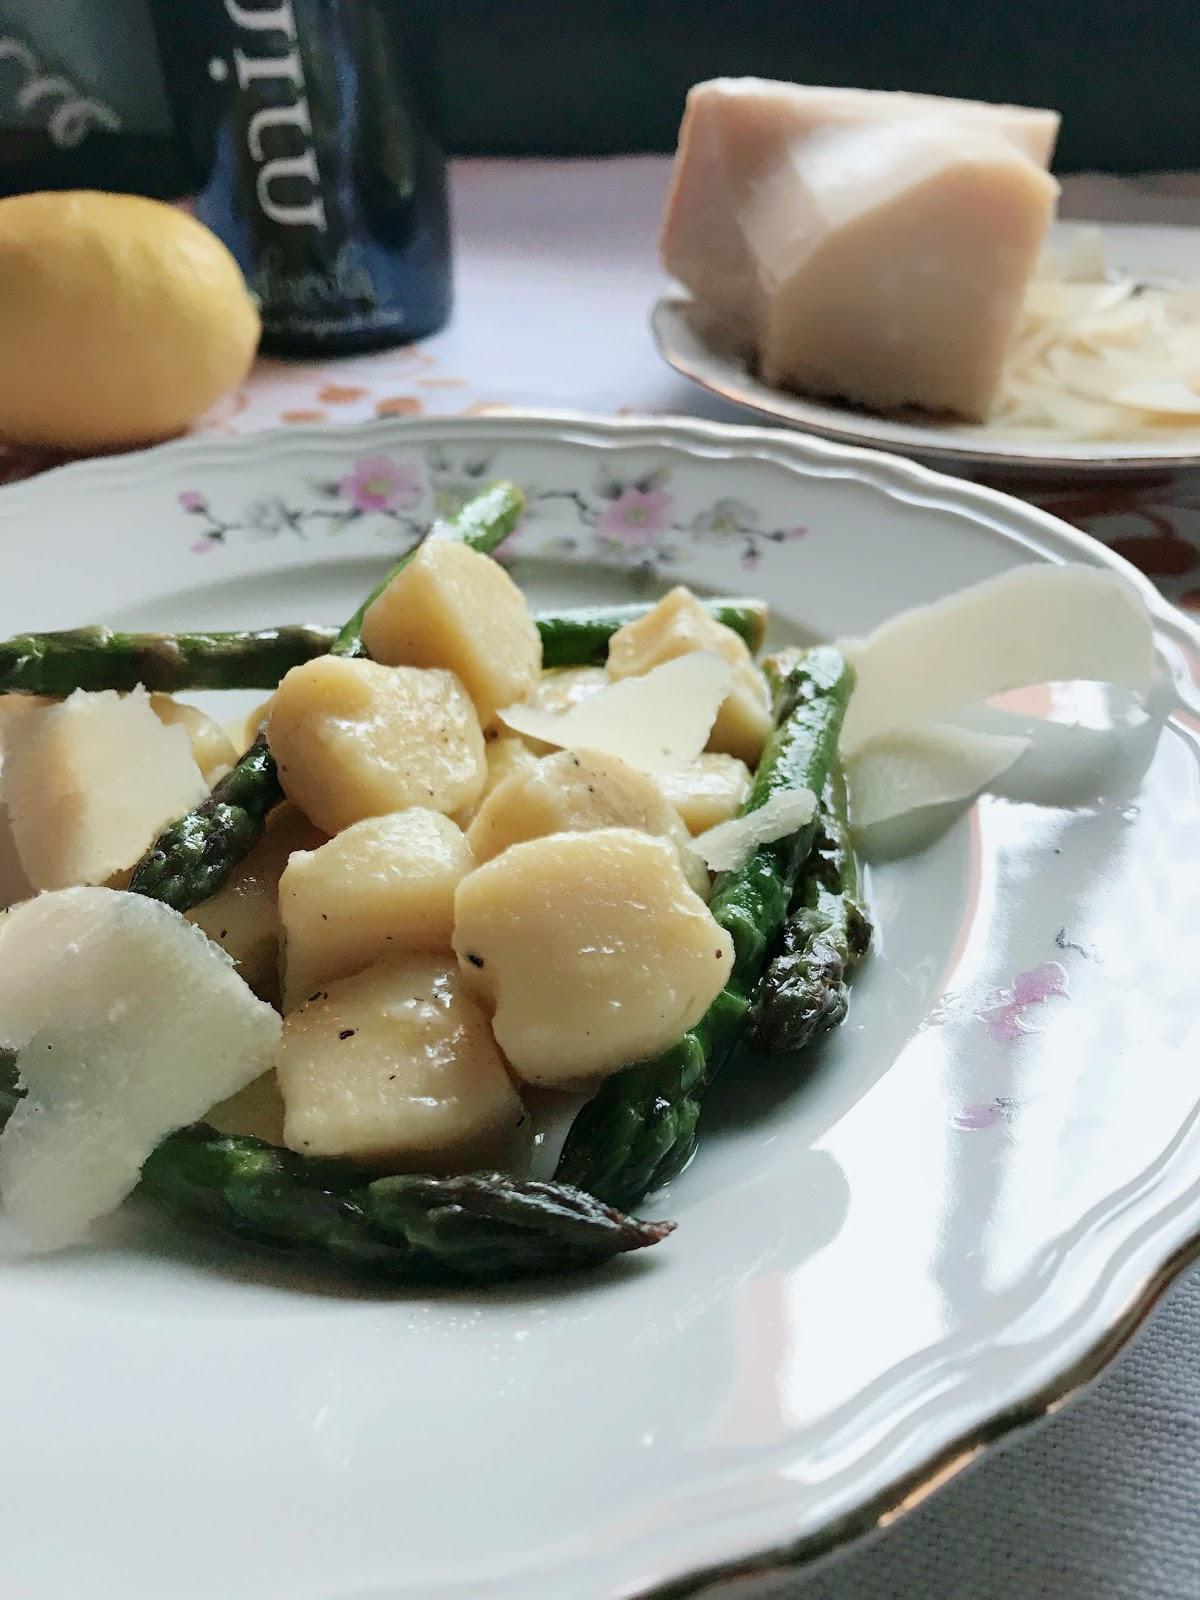 Gnocchi with Asparagus in a Light Creamy Lemon Sauce